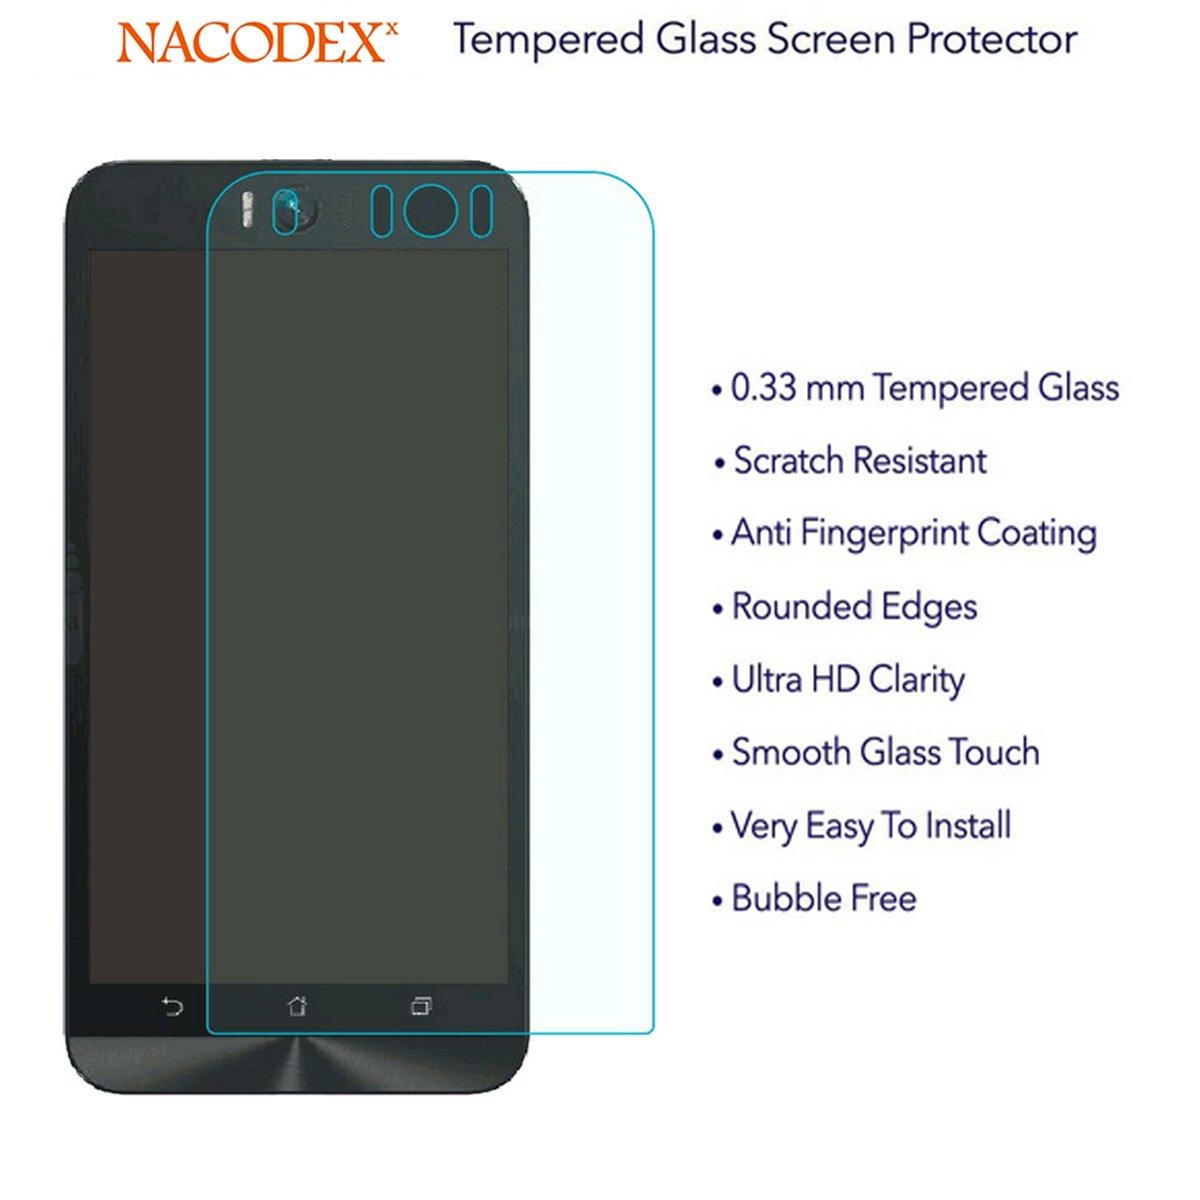 For Asus Zenfone Selfie Zd551kl Tempered Glass Screen New Zenfone4s Zc451cg Protector Nacodex Hd Film Guard Shield 03mm 25d